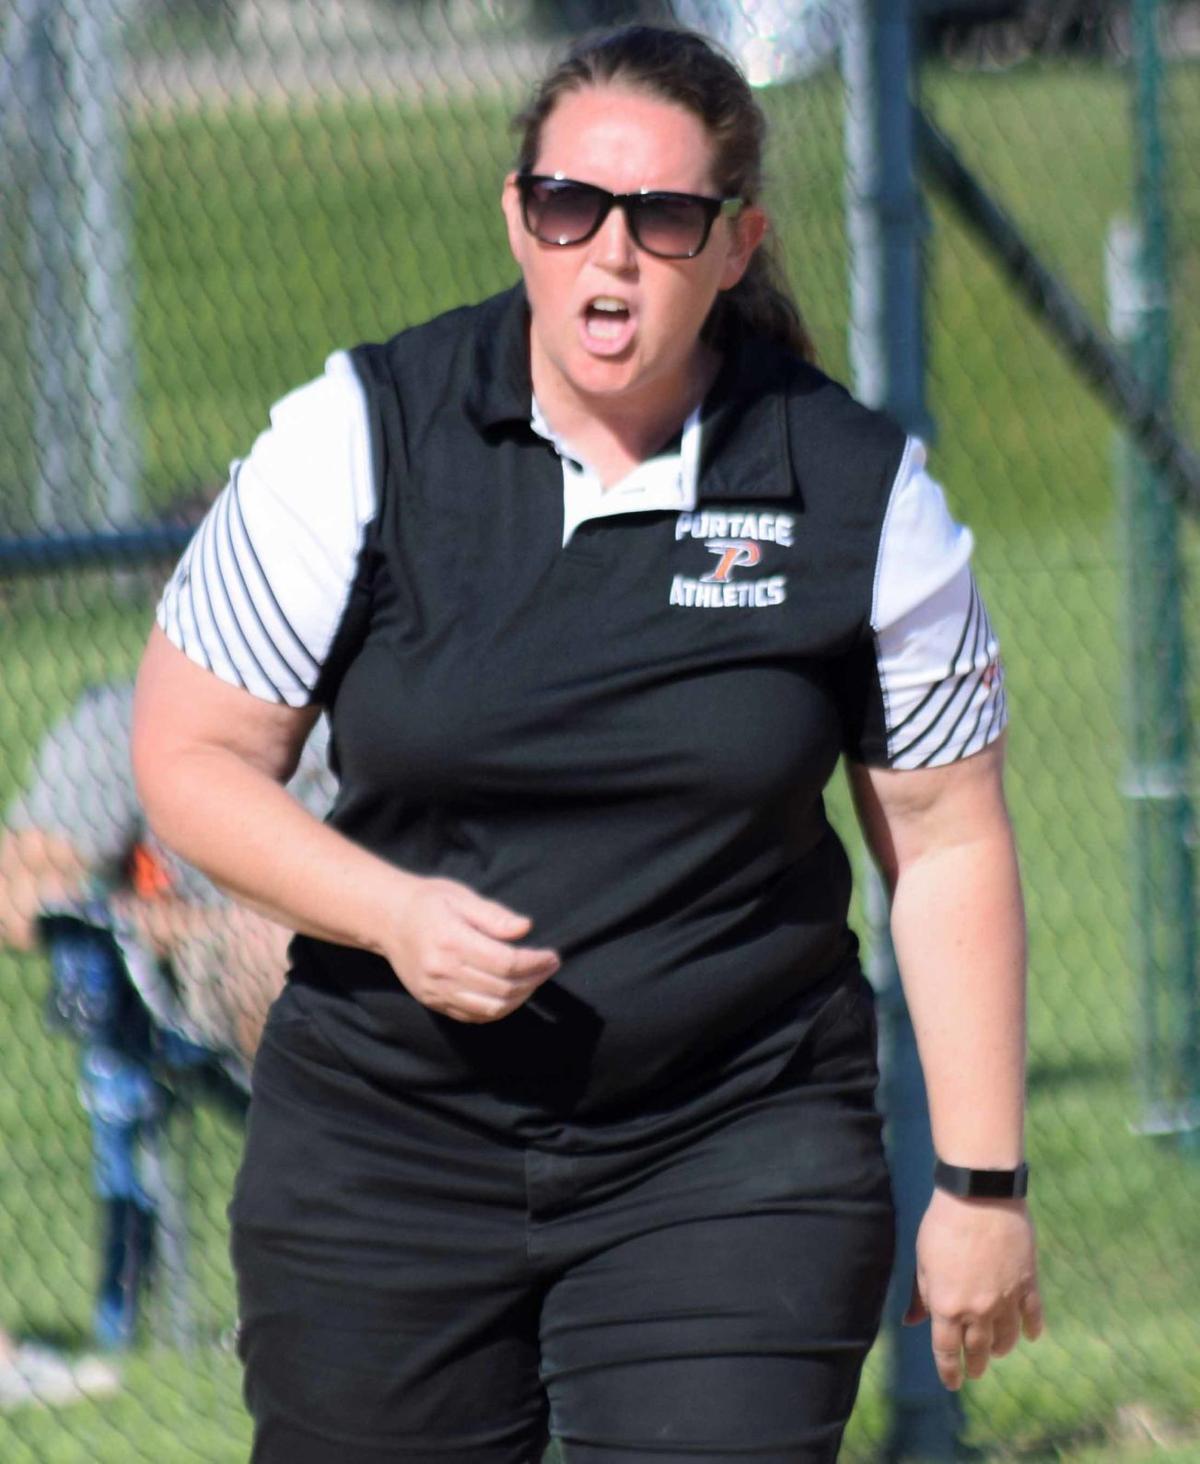 Portage coach Connie Wampler (copy)